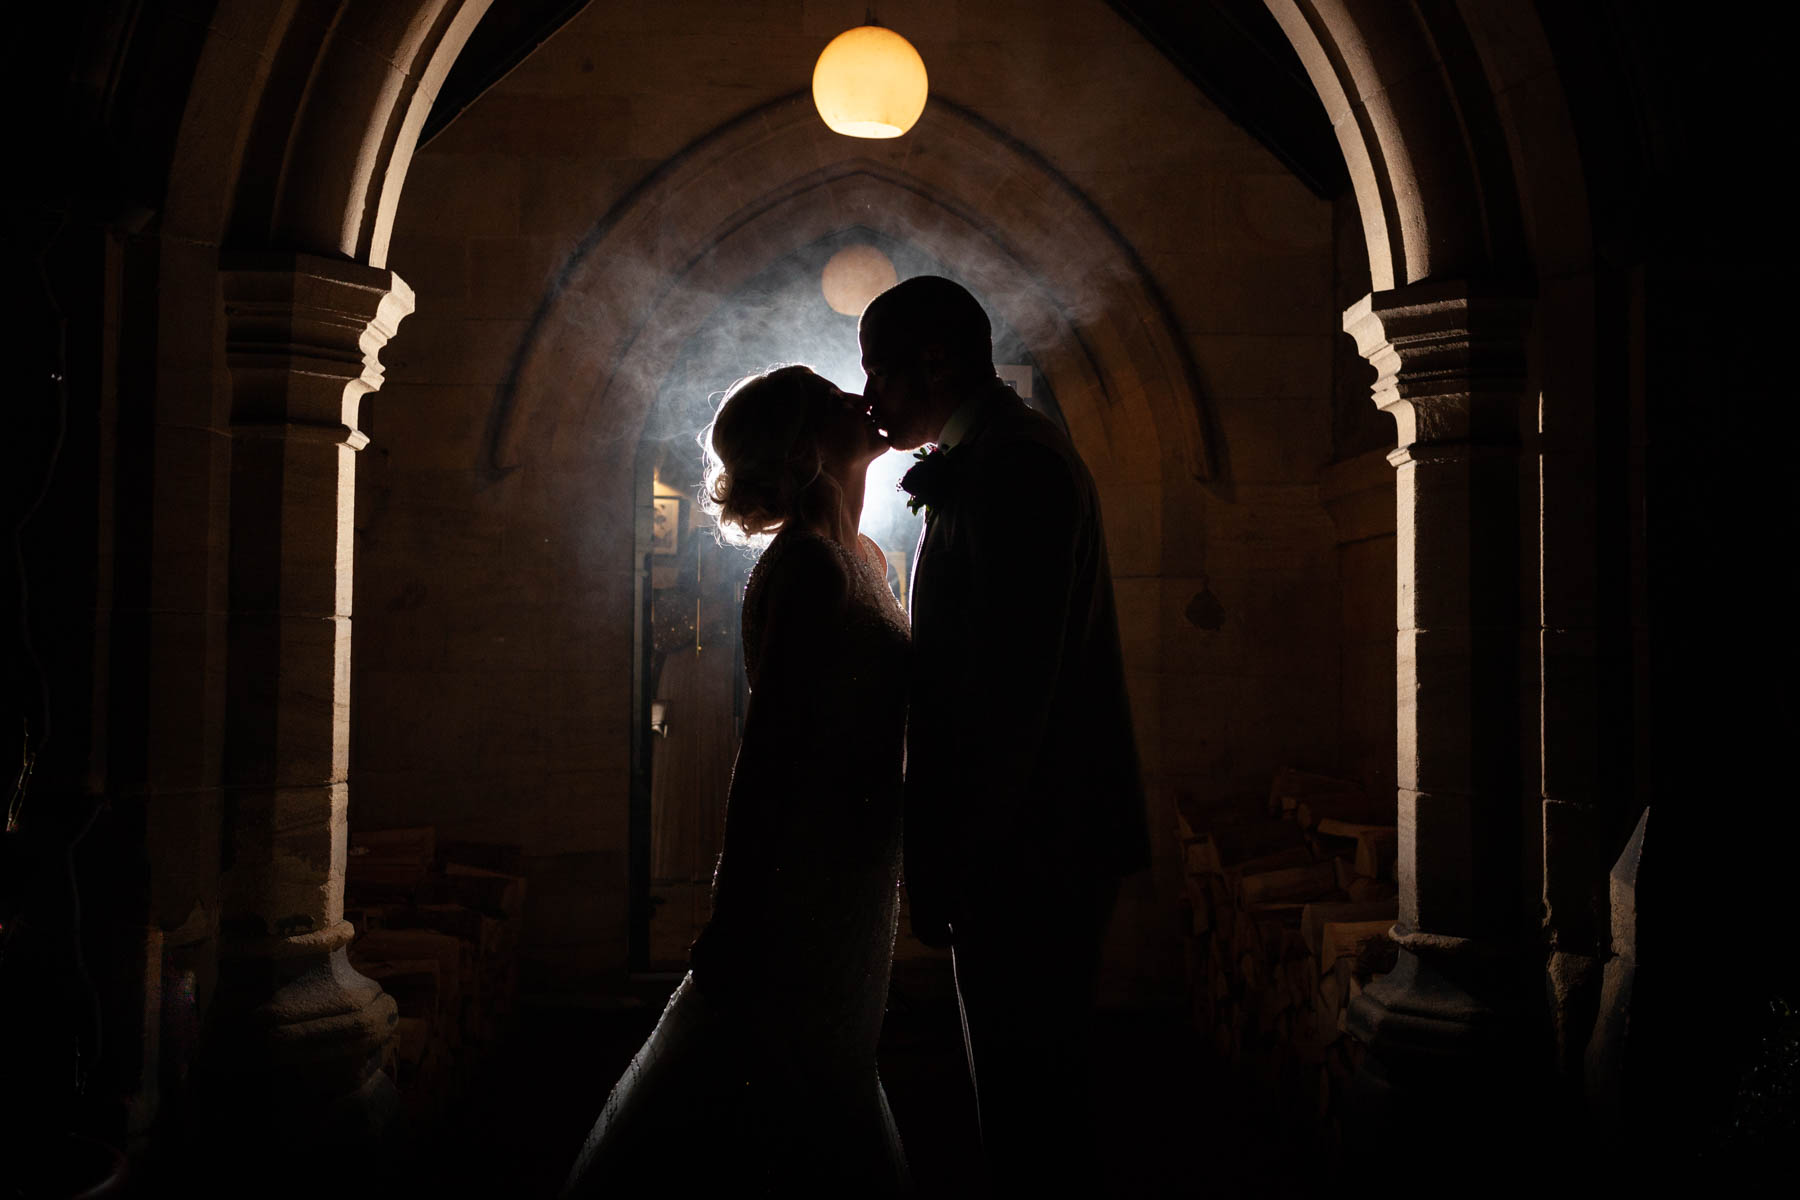 Jesmond Dene House Wedding Photographer - Night Time shot with smoke bomb